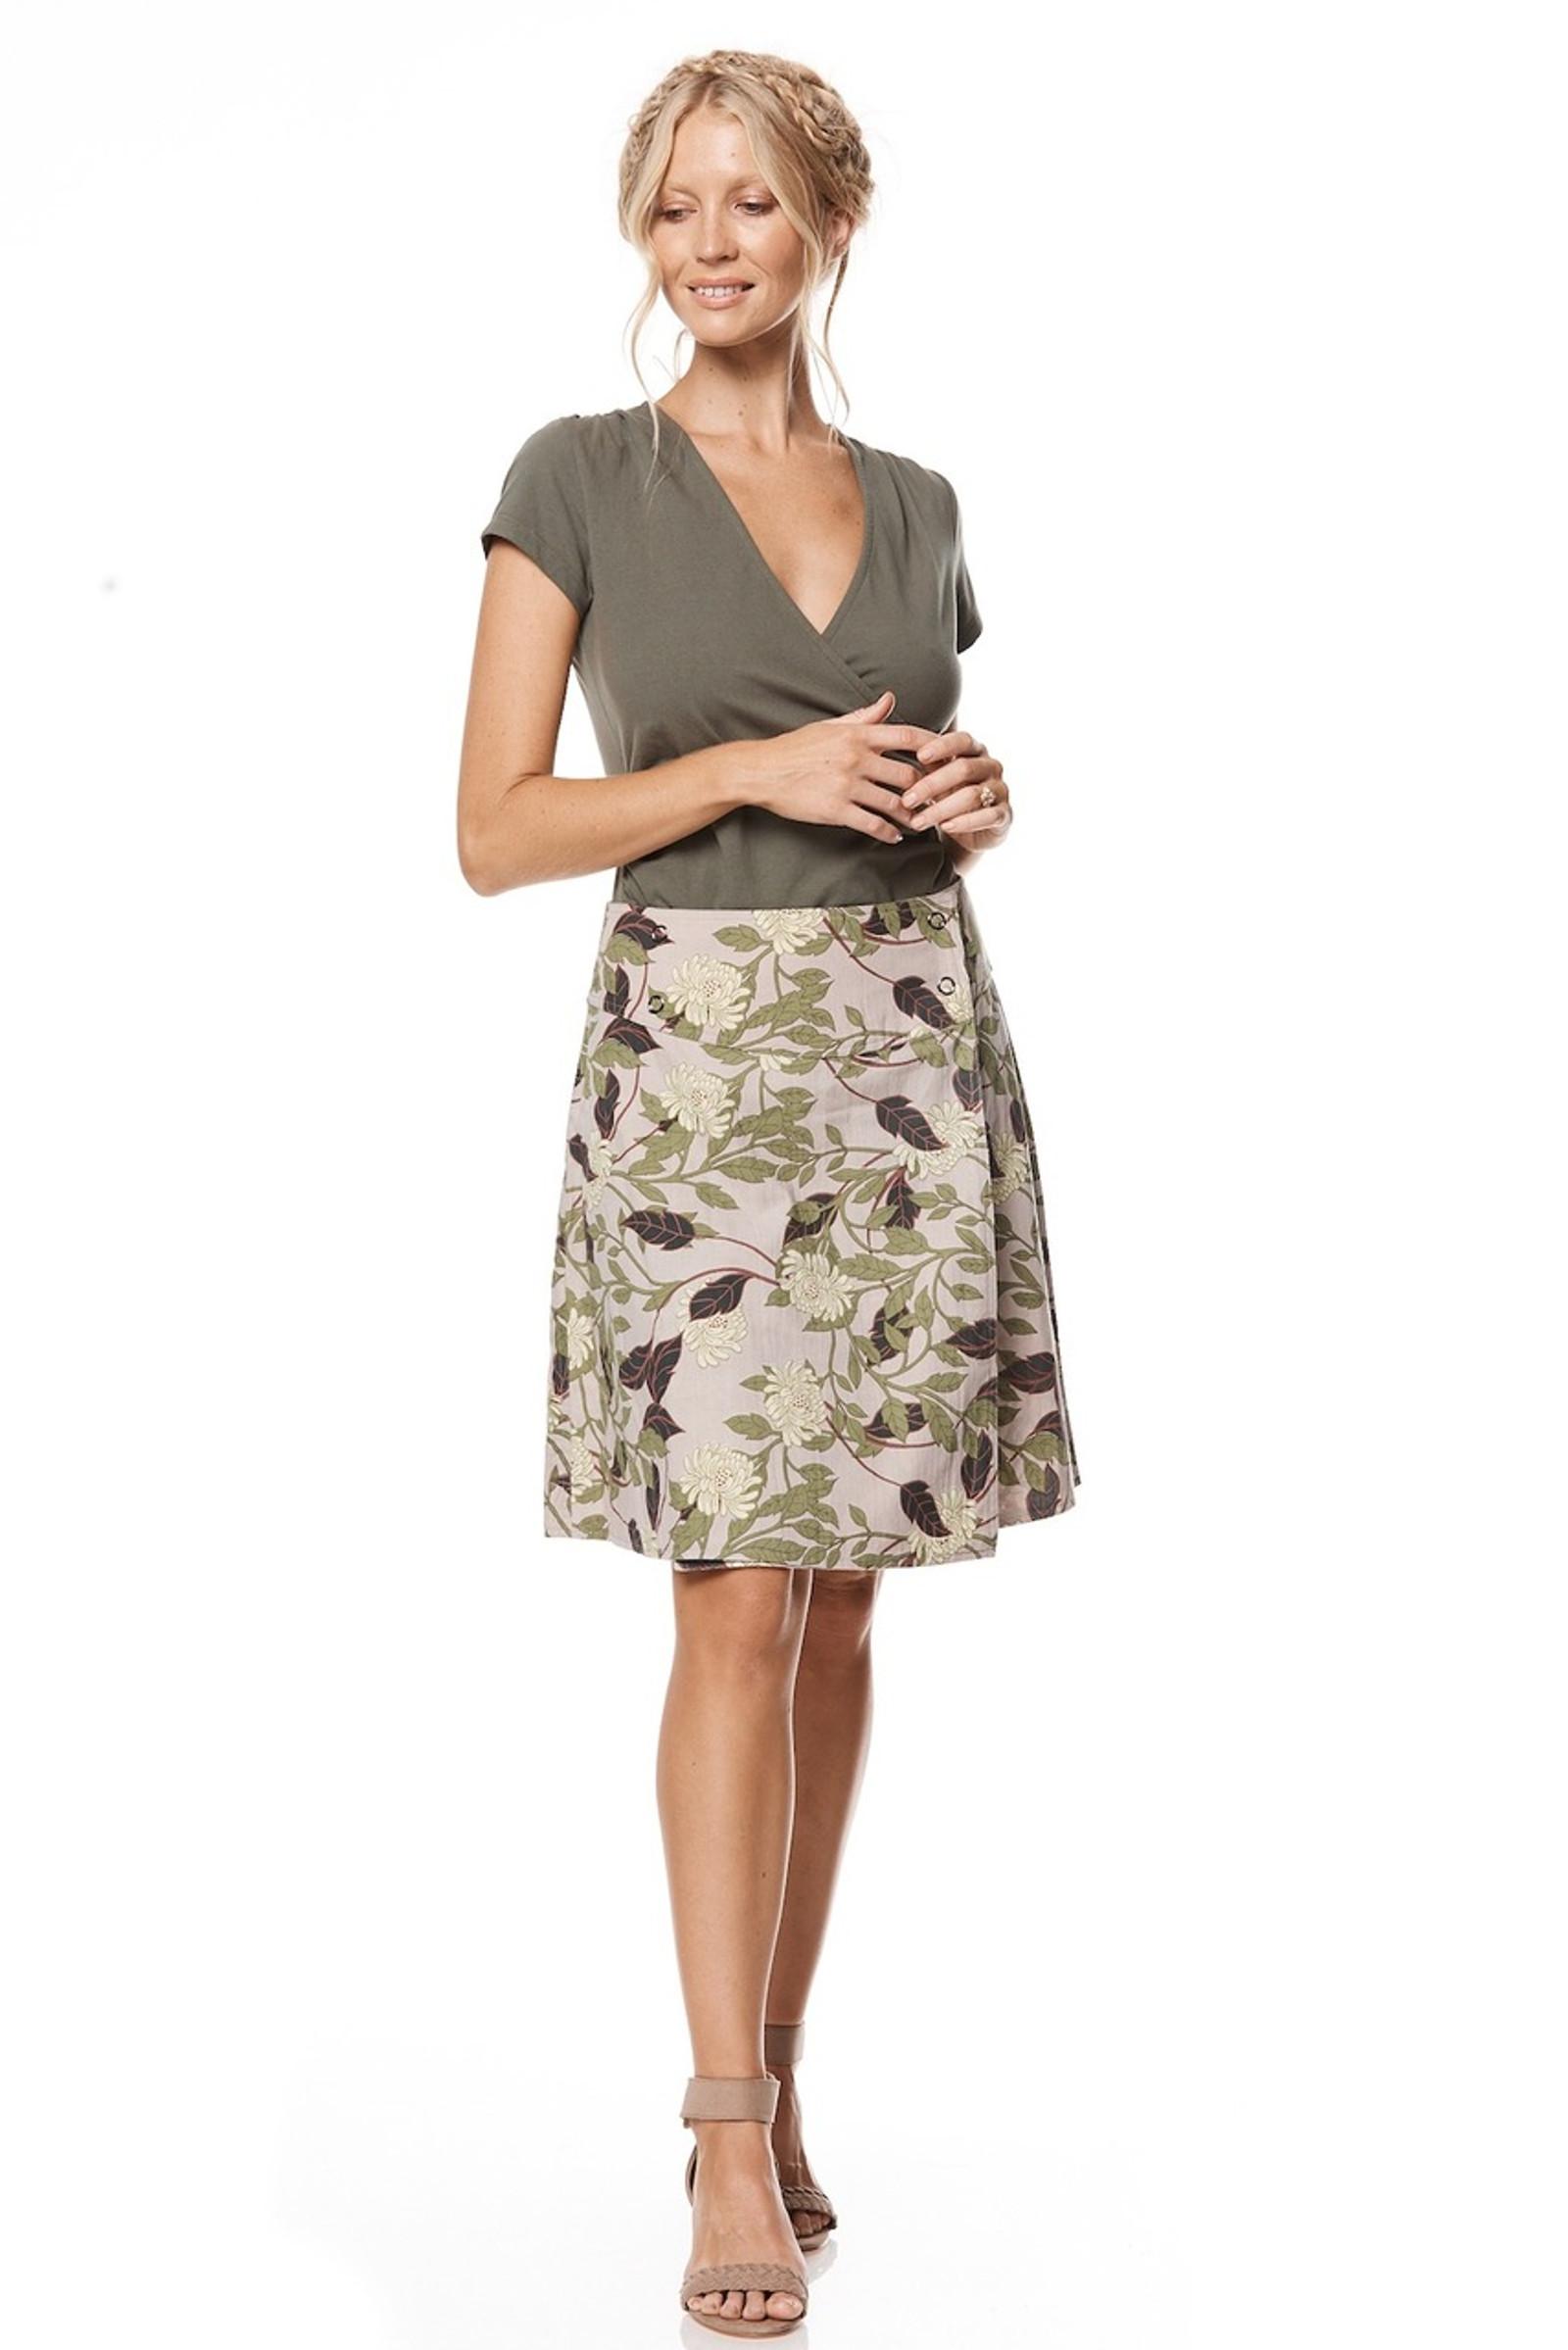 Reversible Skirt - Magnolia & Freesia